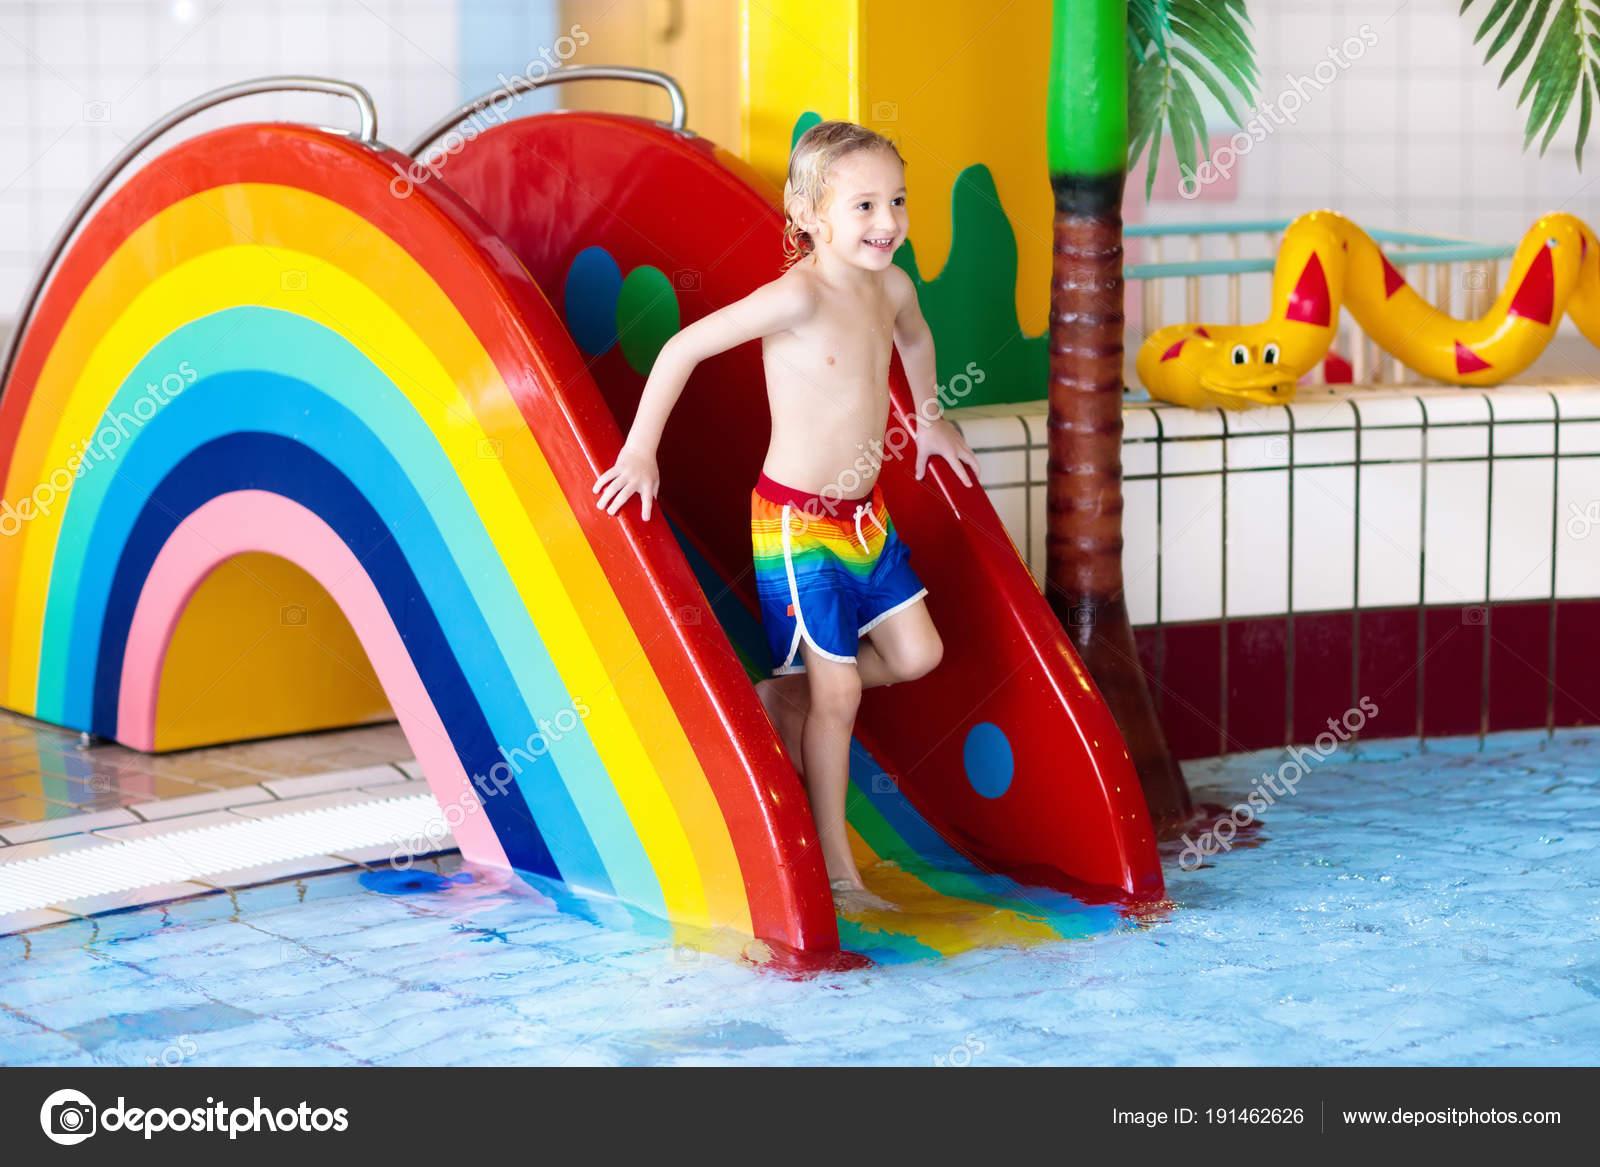 Child On Swimming Pool Slide Kid Having Fun Sliding In Water Amusement Park Kids Swim Family Summer Vacation Tropical Resort